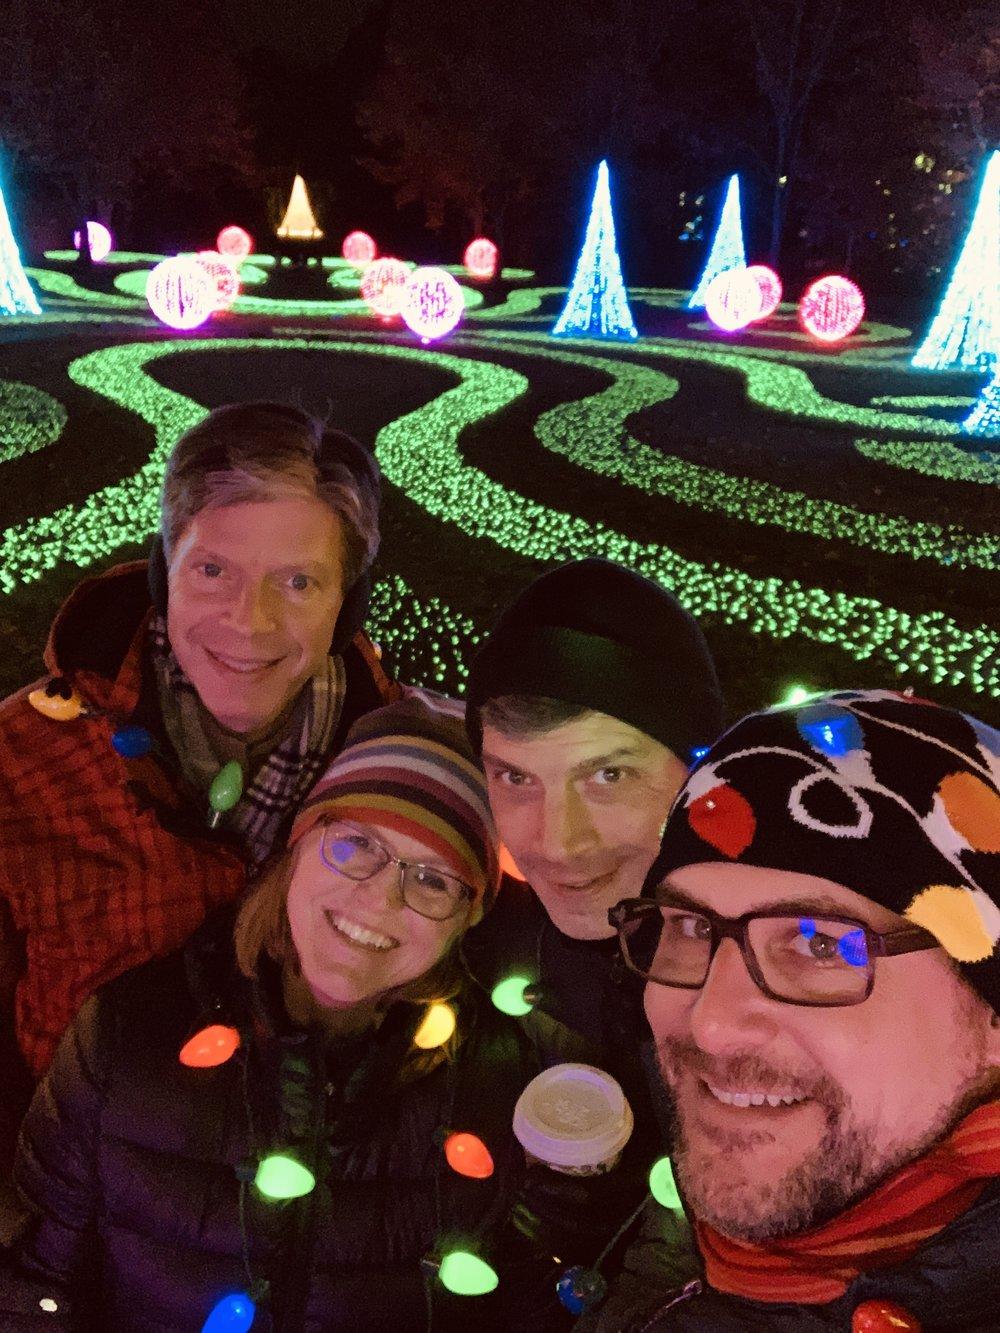 The Strachan Clan at Winterlights